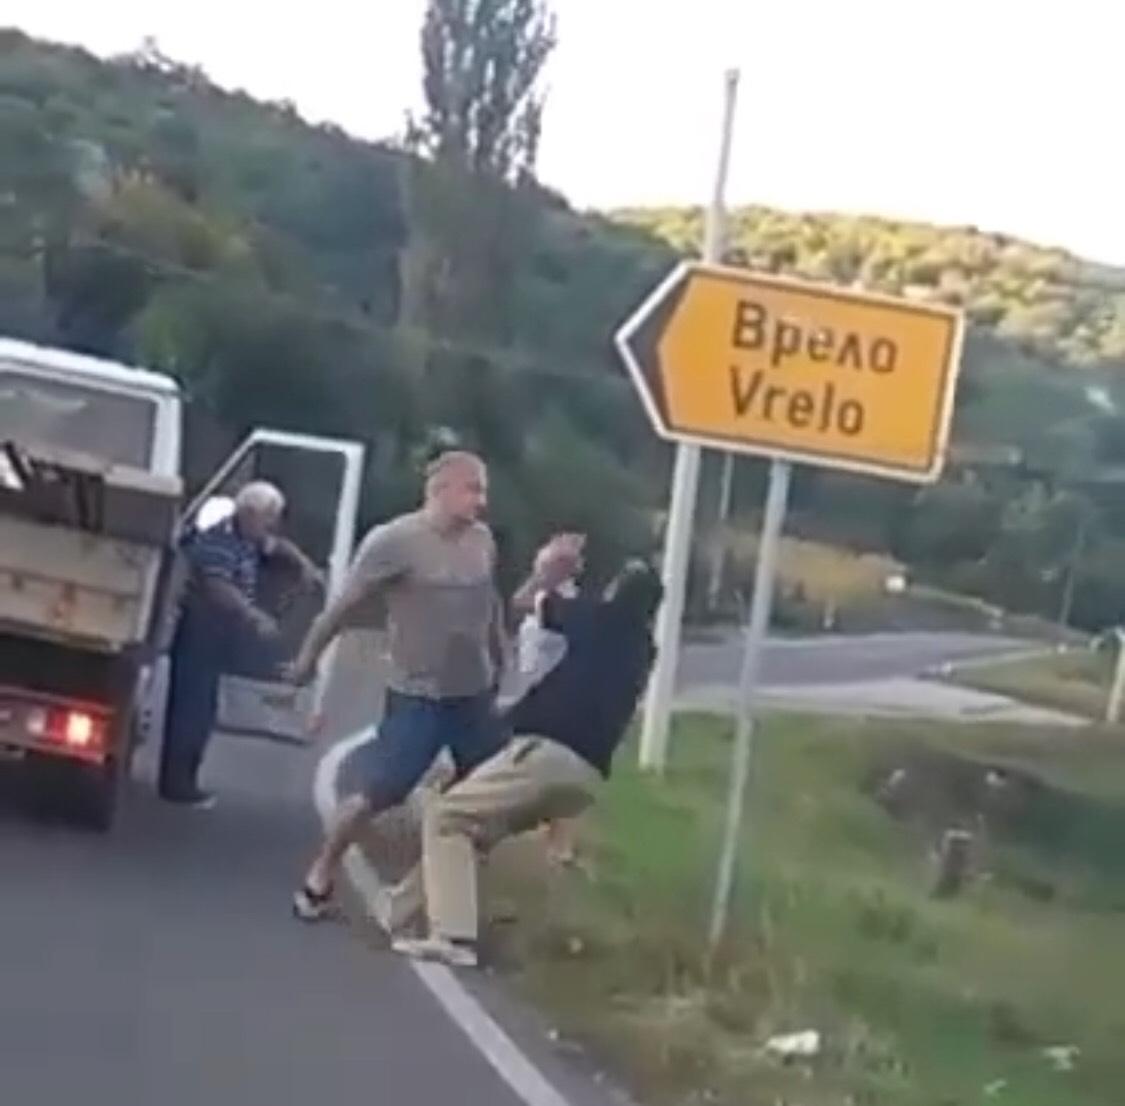 BAHATO: Tuča nasred puta na ulazu u Vrelo (VIDEO)